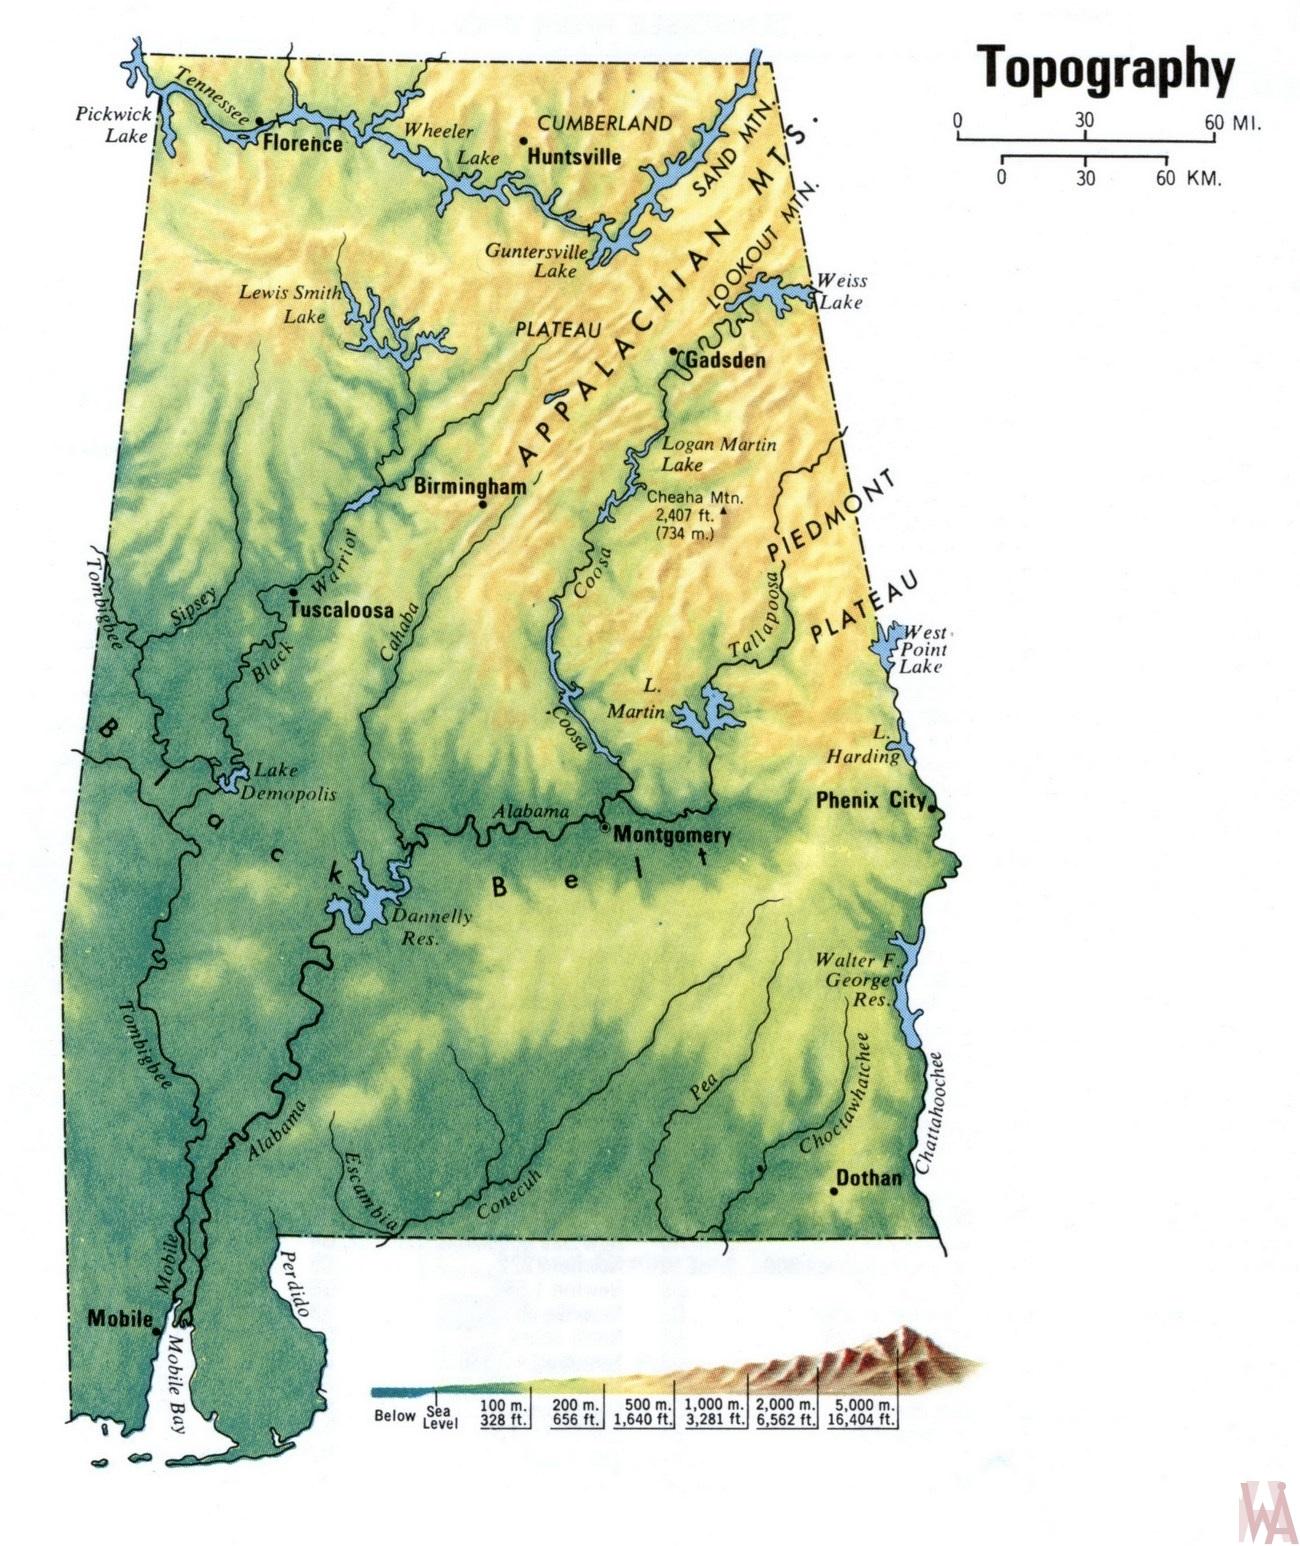 Alabama Topography  Map |  Topography  Map of Alabama